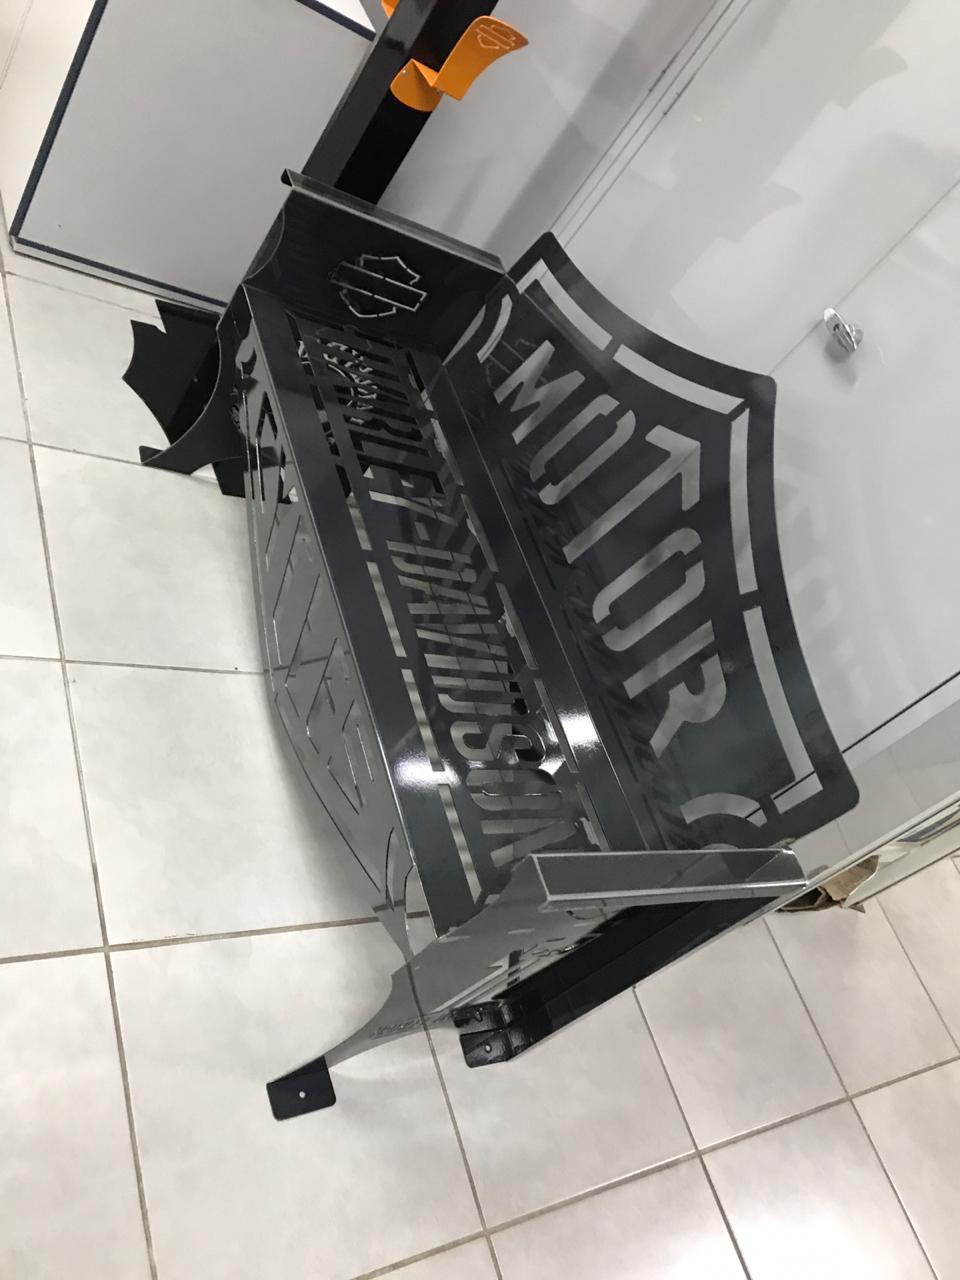 Banco Harley-Davidson 1,25m LIXADO E ENVERNIZADO  - HDC Brasil